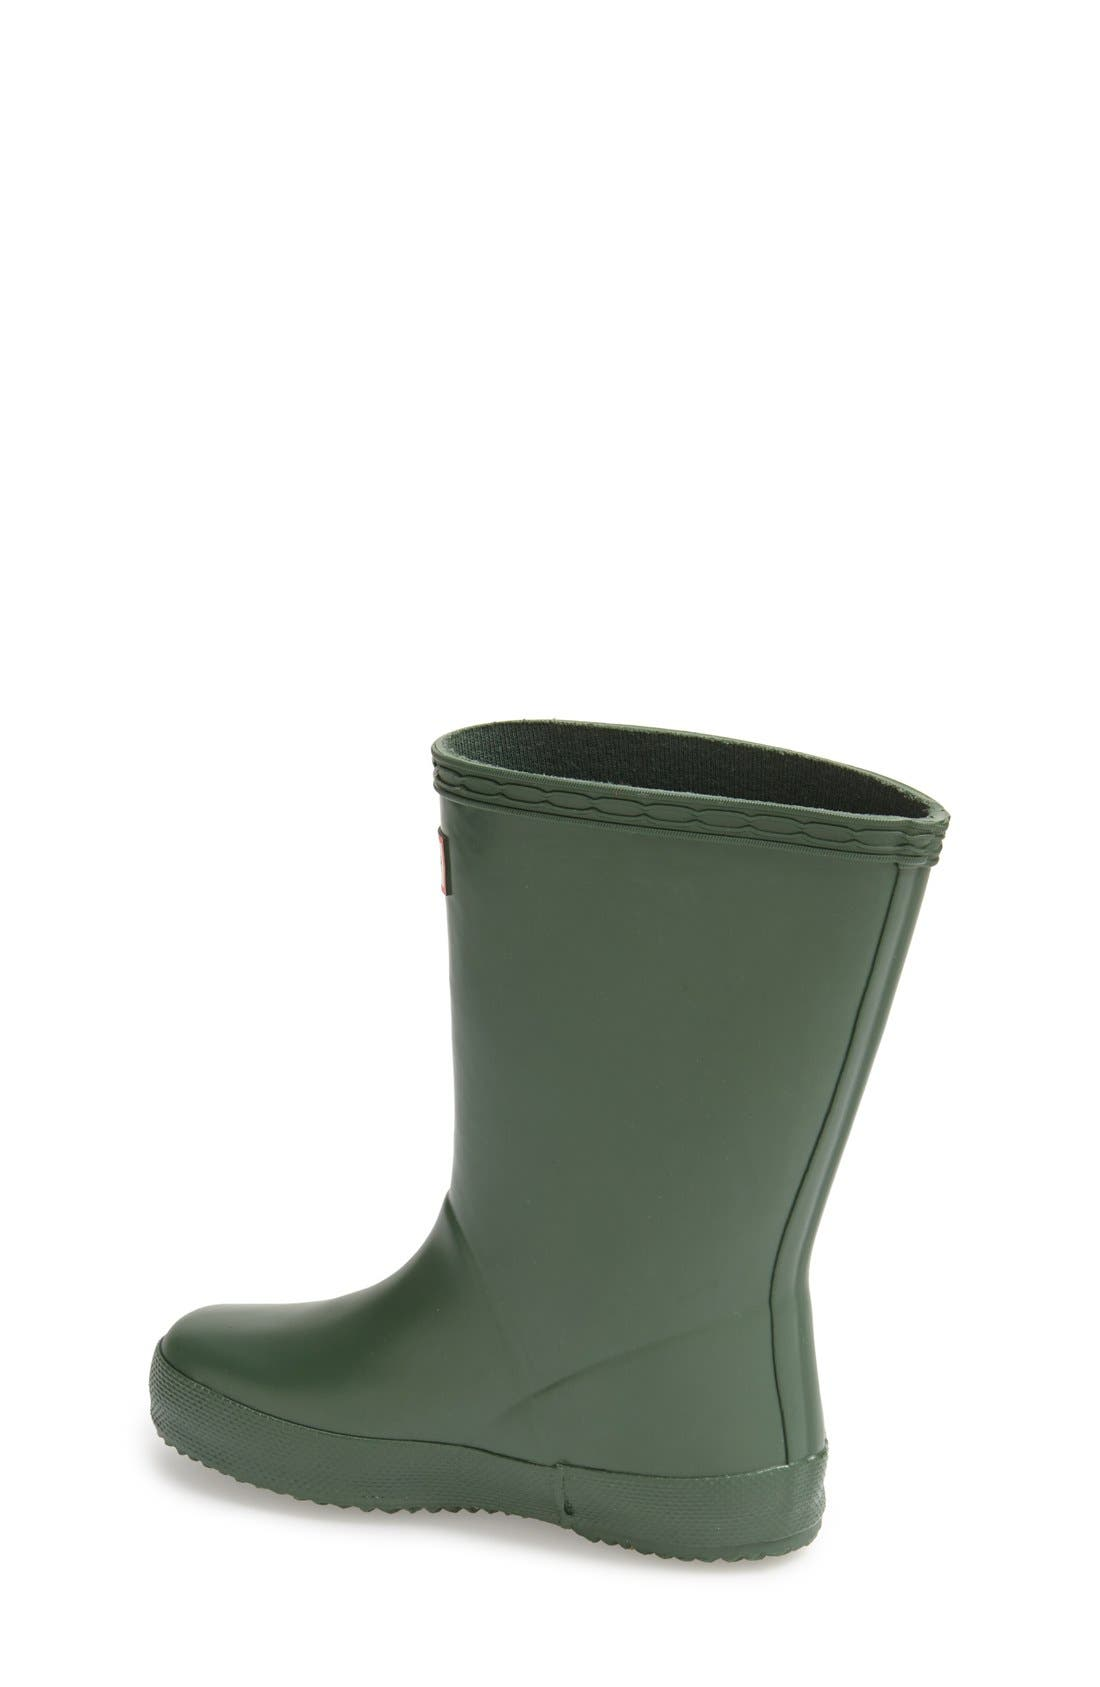 Alternate Image 2  - Hunter 'First Classic' Rain Boot (Walker, Toddler & Little Kid)